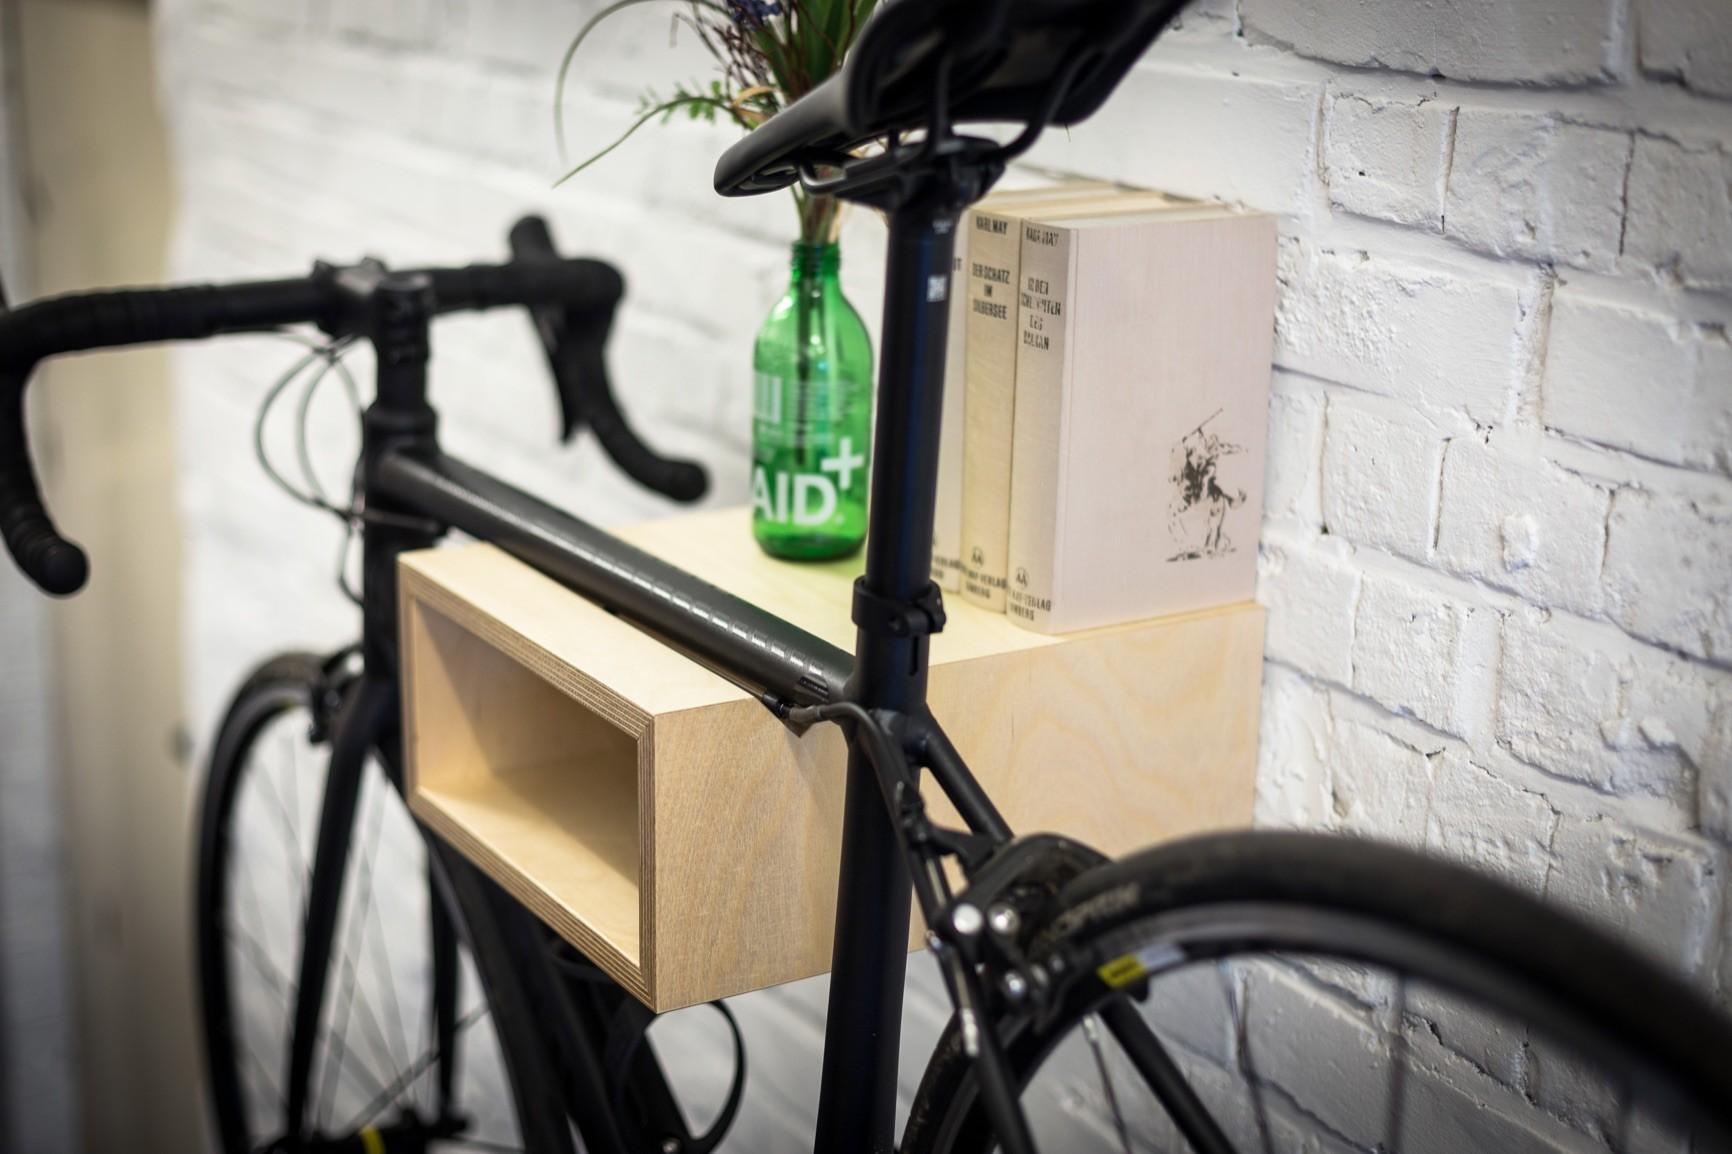 gustav fahrrad wandhalterung aus holz fahrradwandhalter. Black Bedroom Furniture Sets. Home Design Ideas